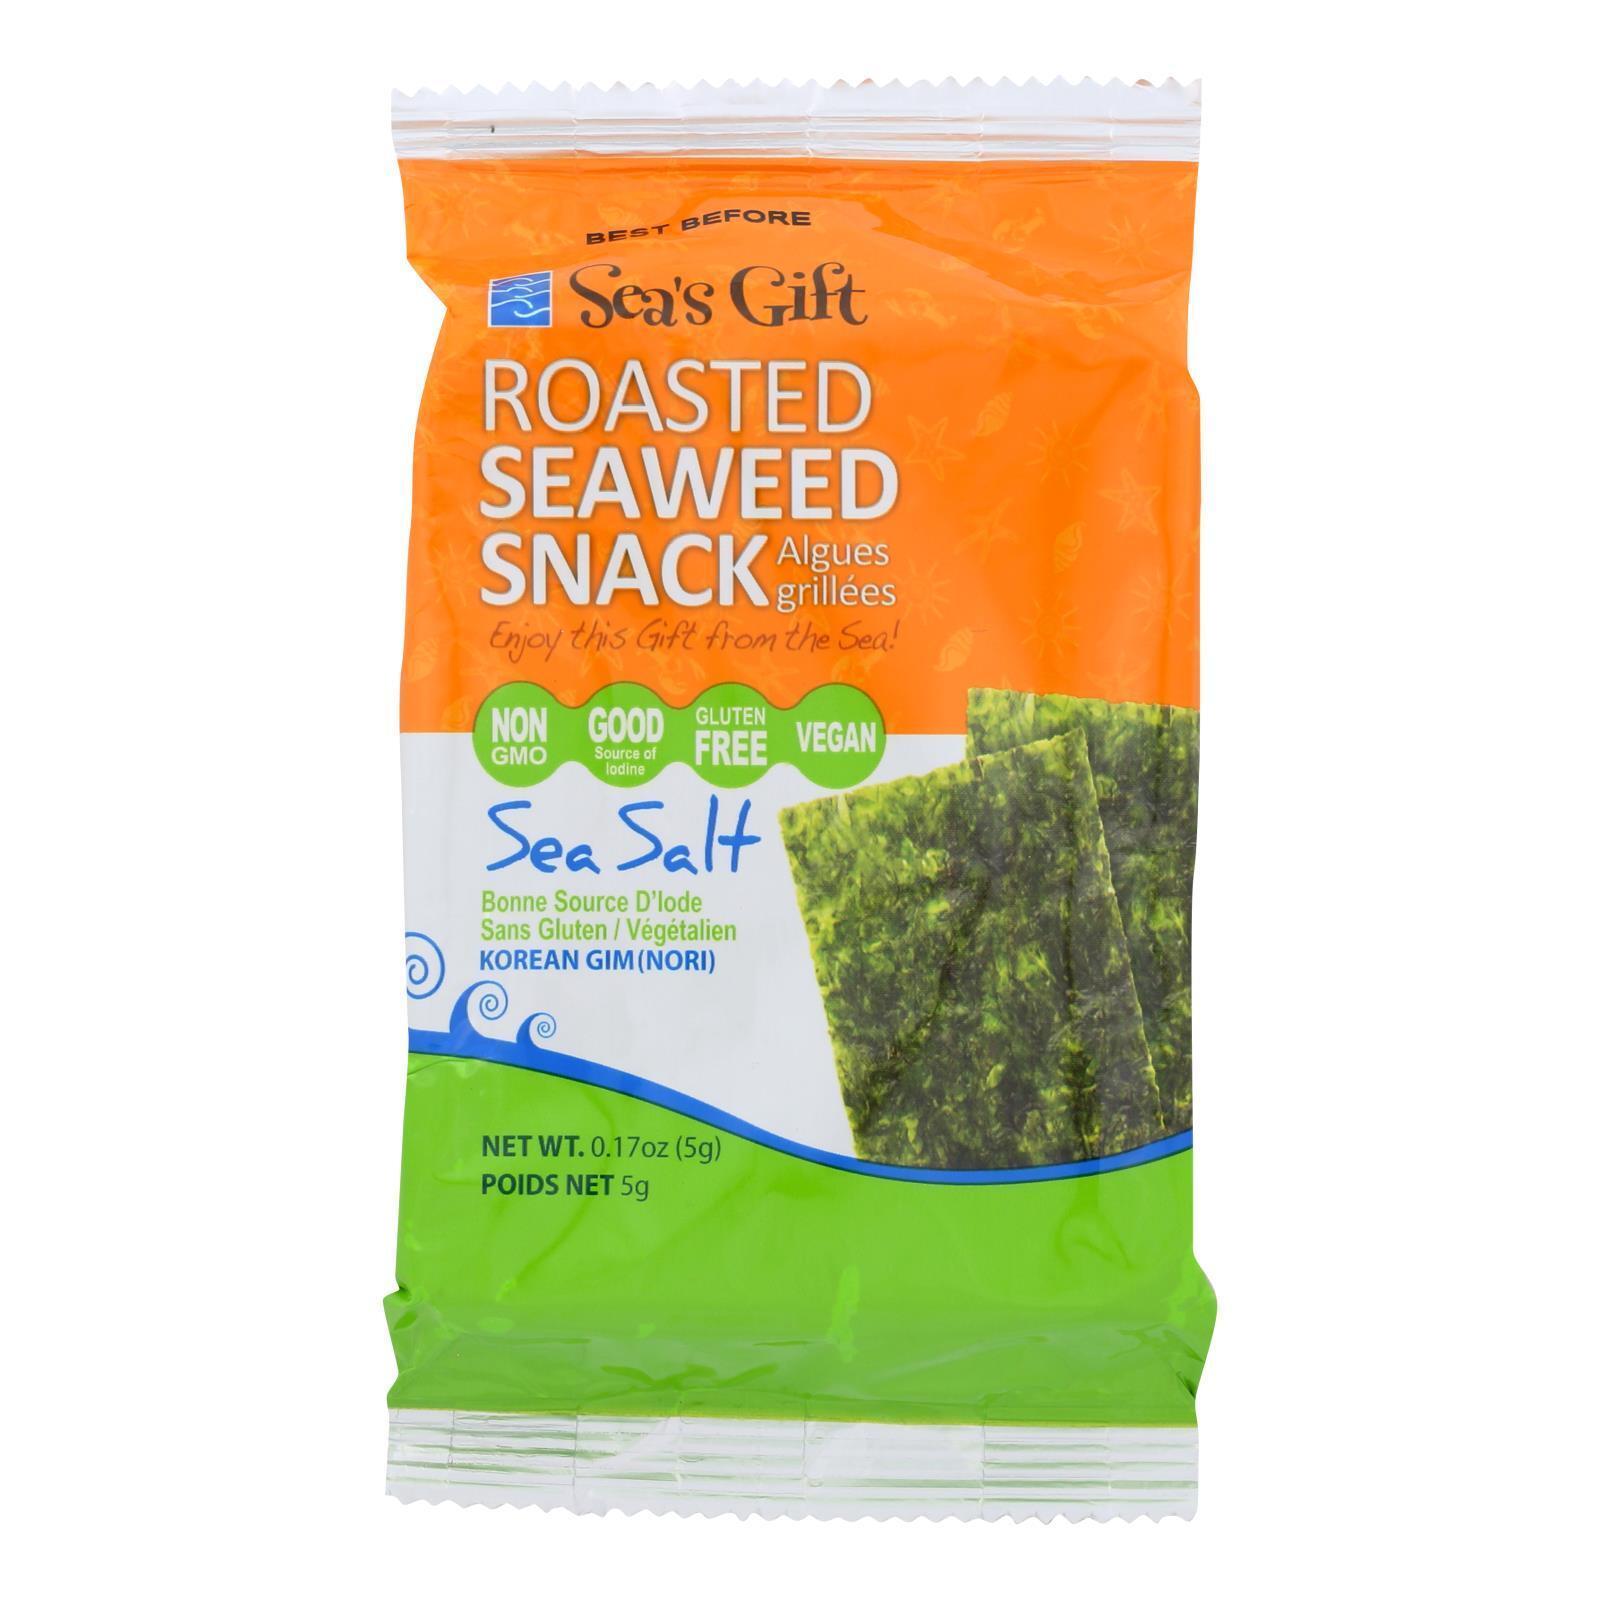 Sea's Gift Seaweed Snack - Roasted and Sea Salt - Case of 24 - 0.17 oz.